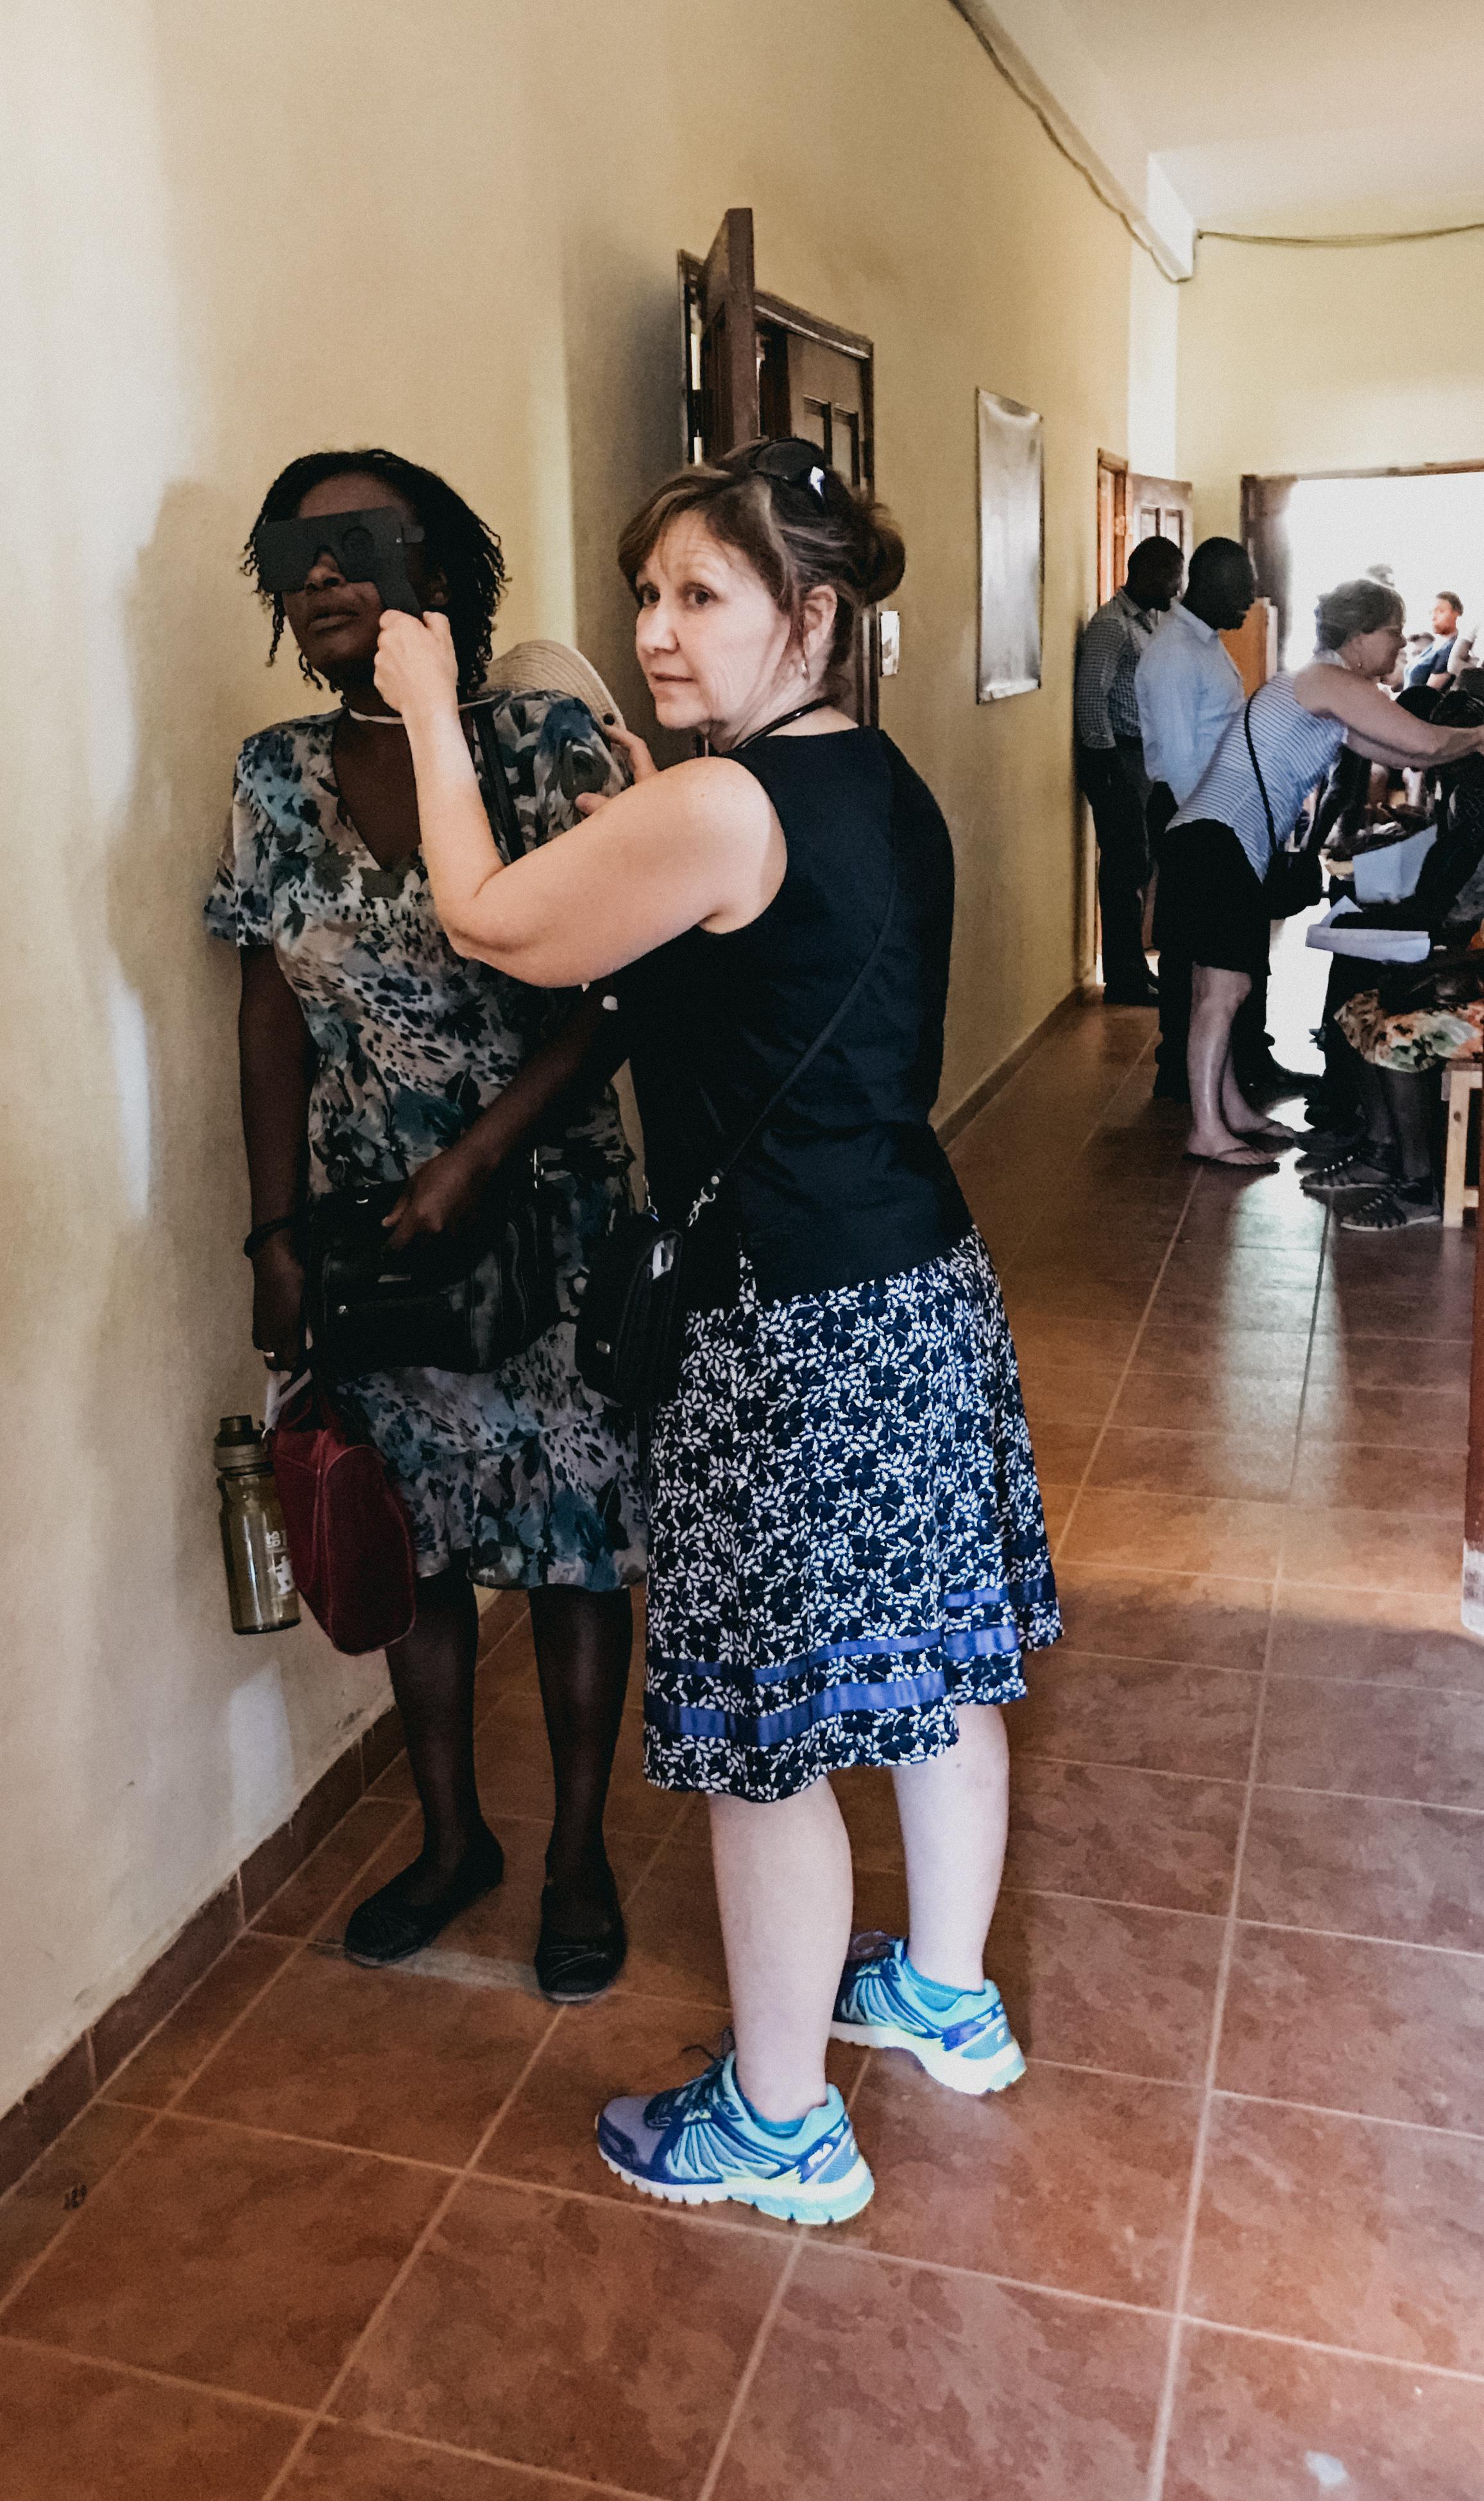 Haiti_Medical_Missions_Healing_Art_Missions005.JPG